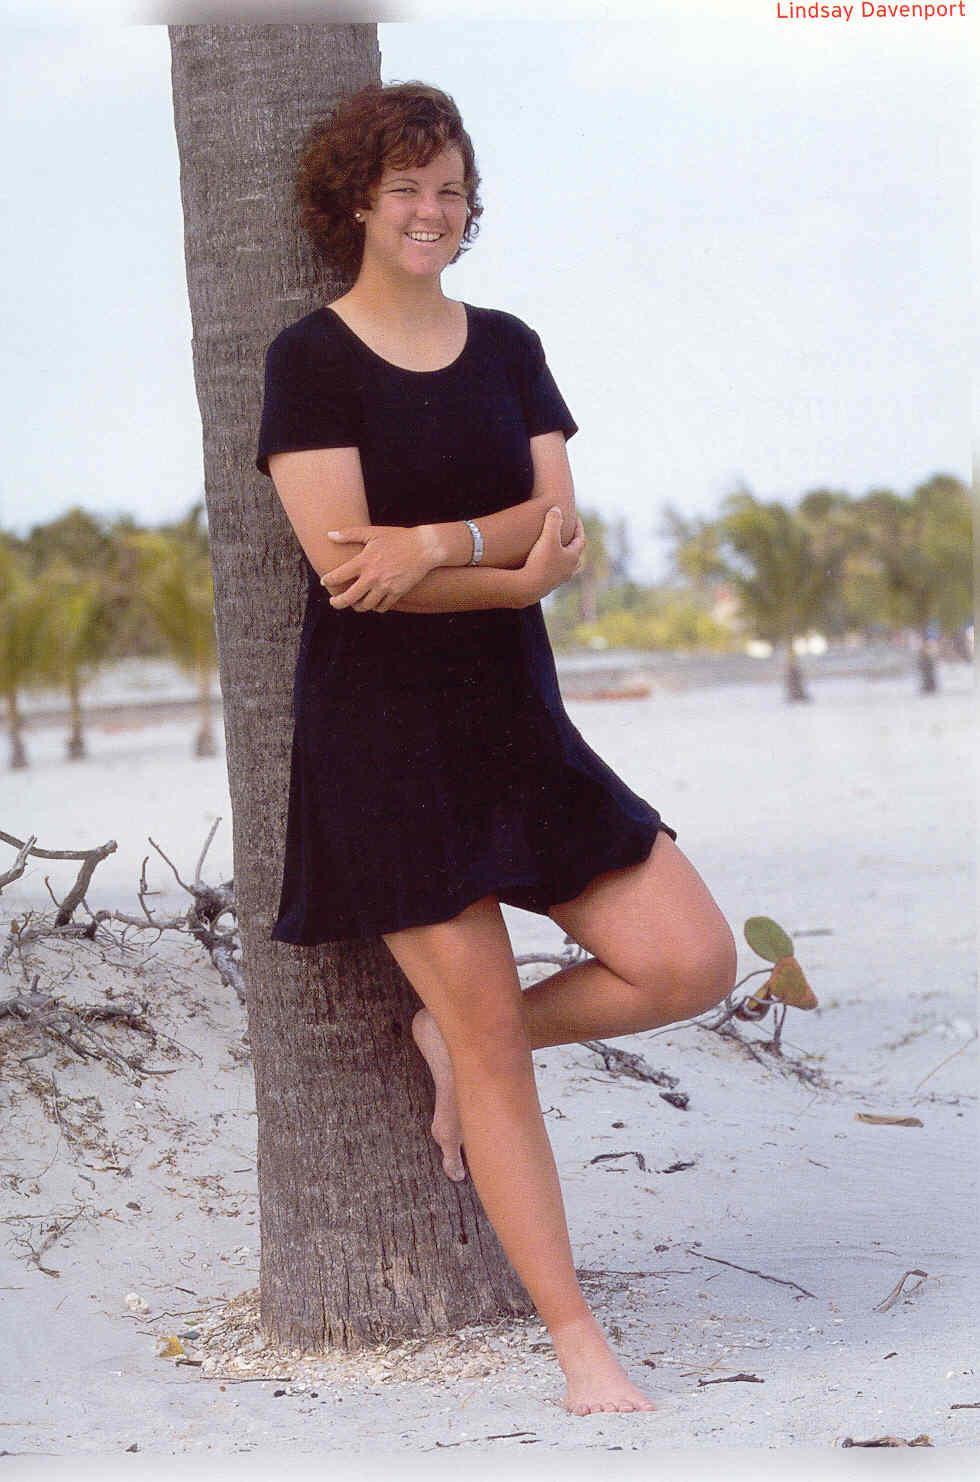 Lindsay Davenport s Feet wikiFeet